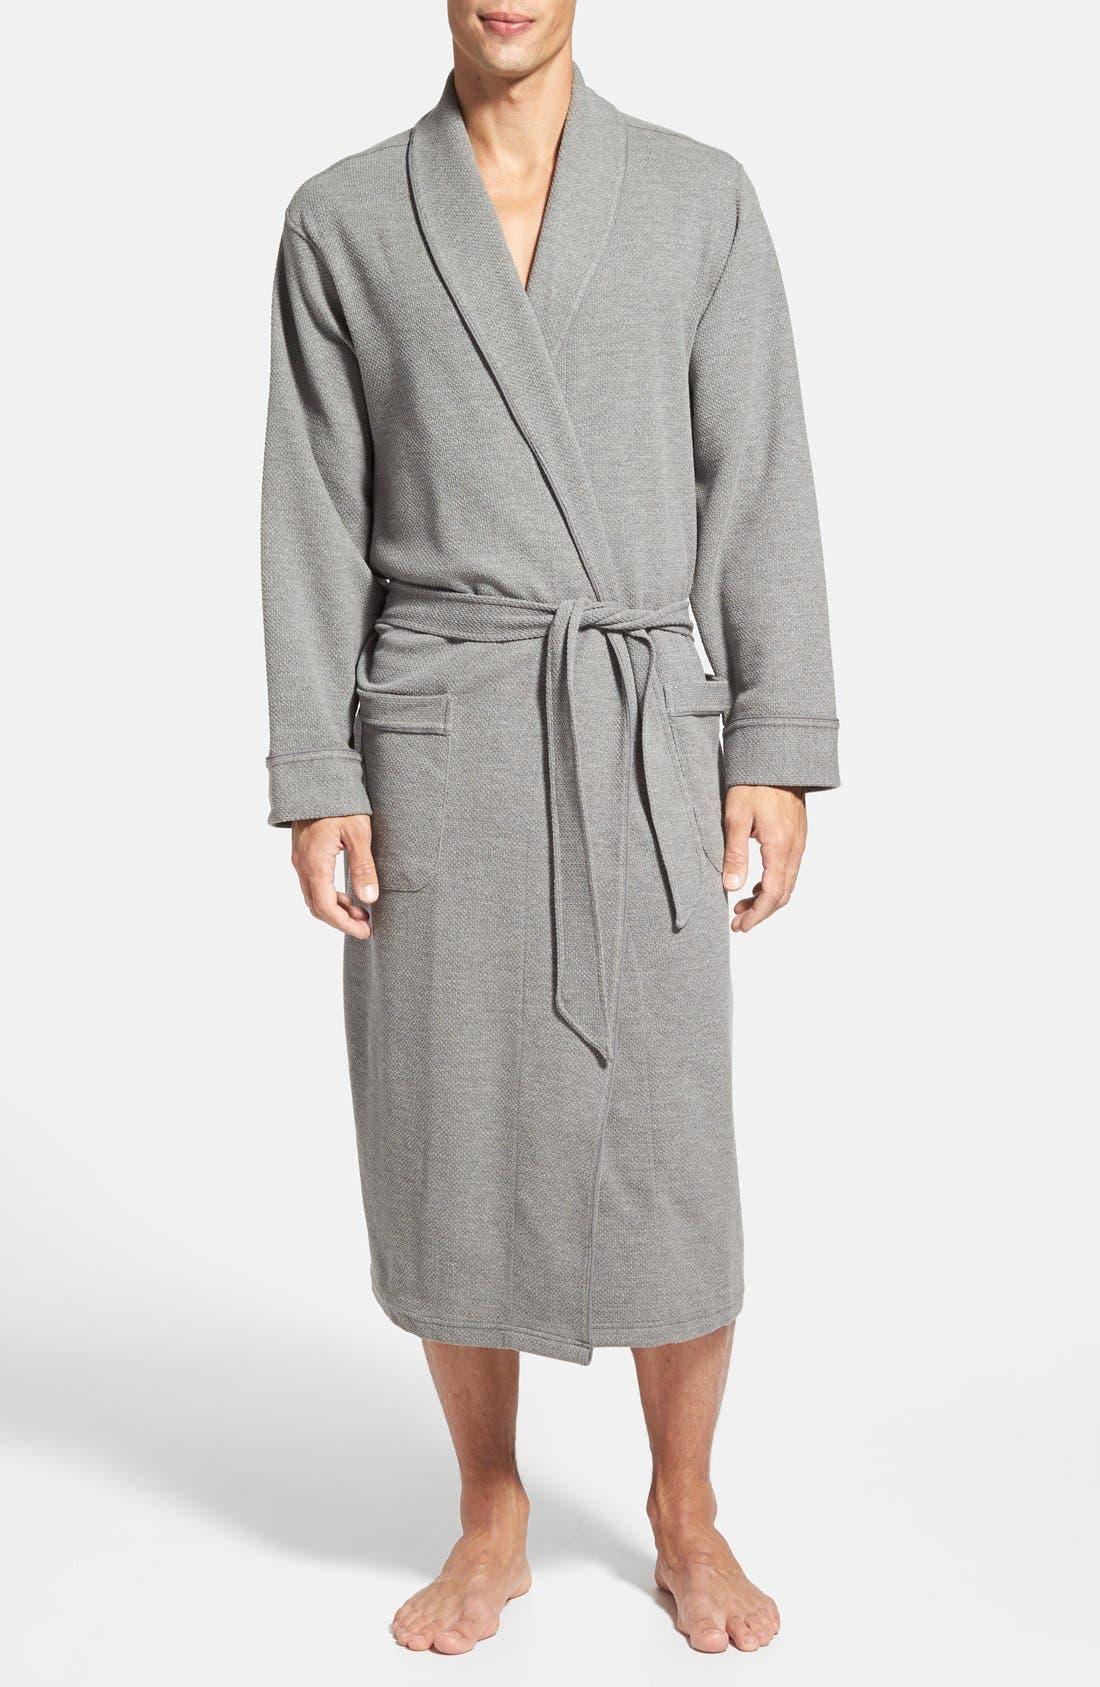 Alternate Image 1 Selected - Nordstrom Men's Shop Thermal Knit Robe